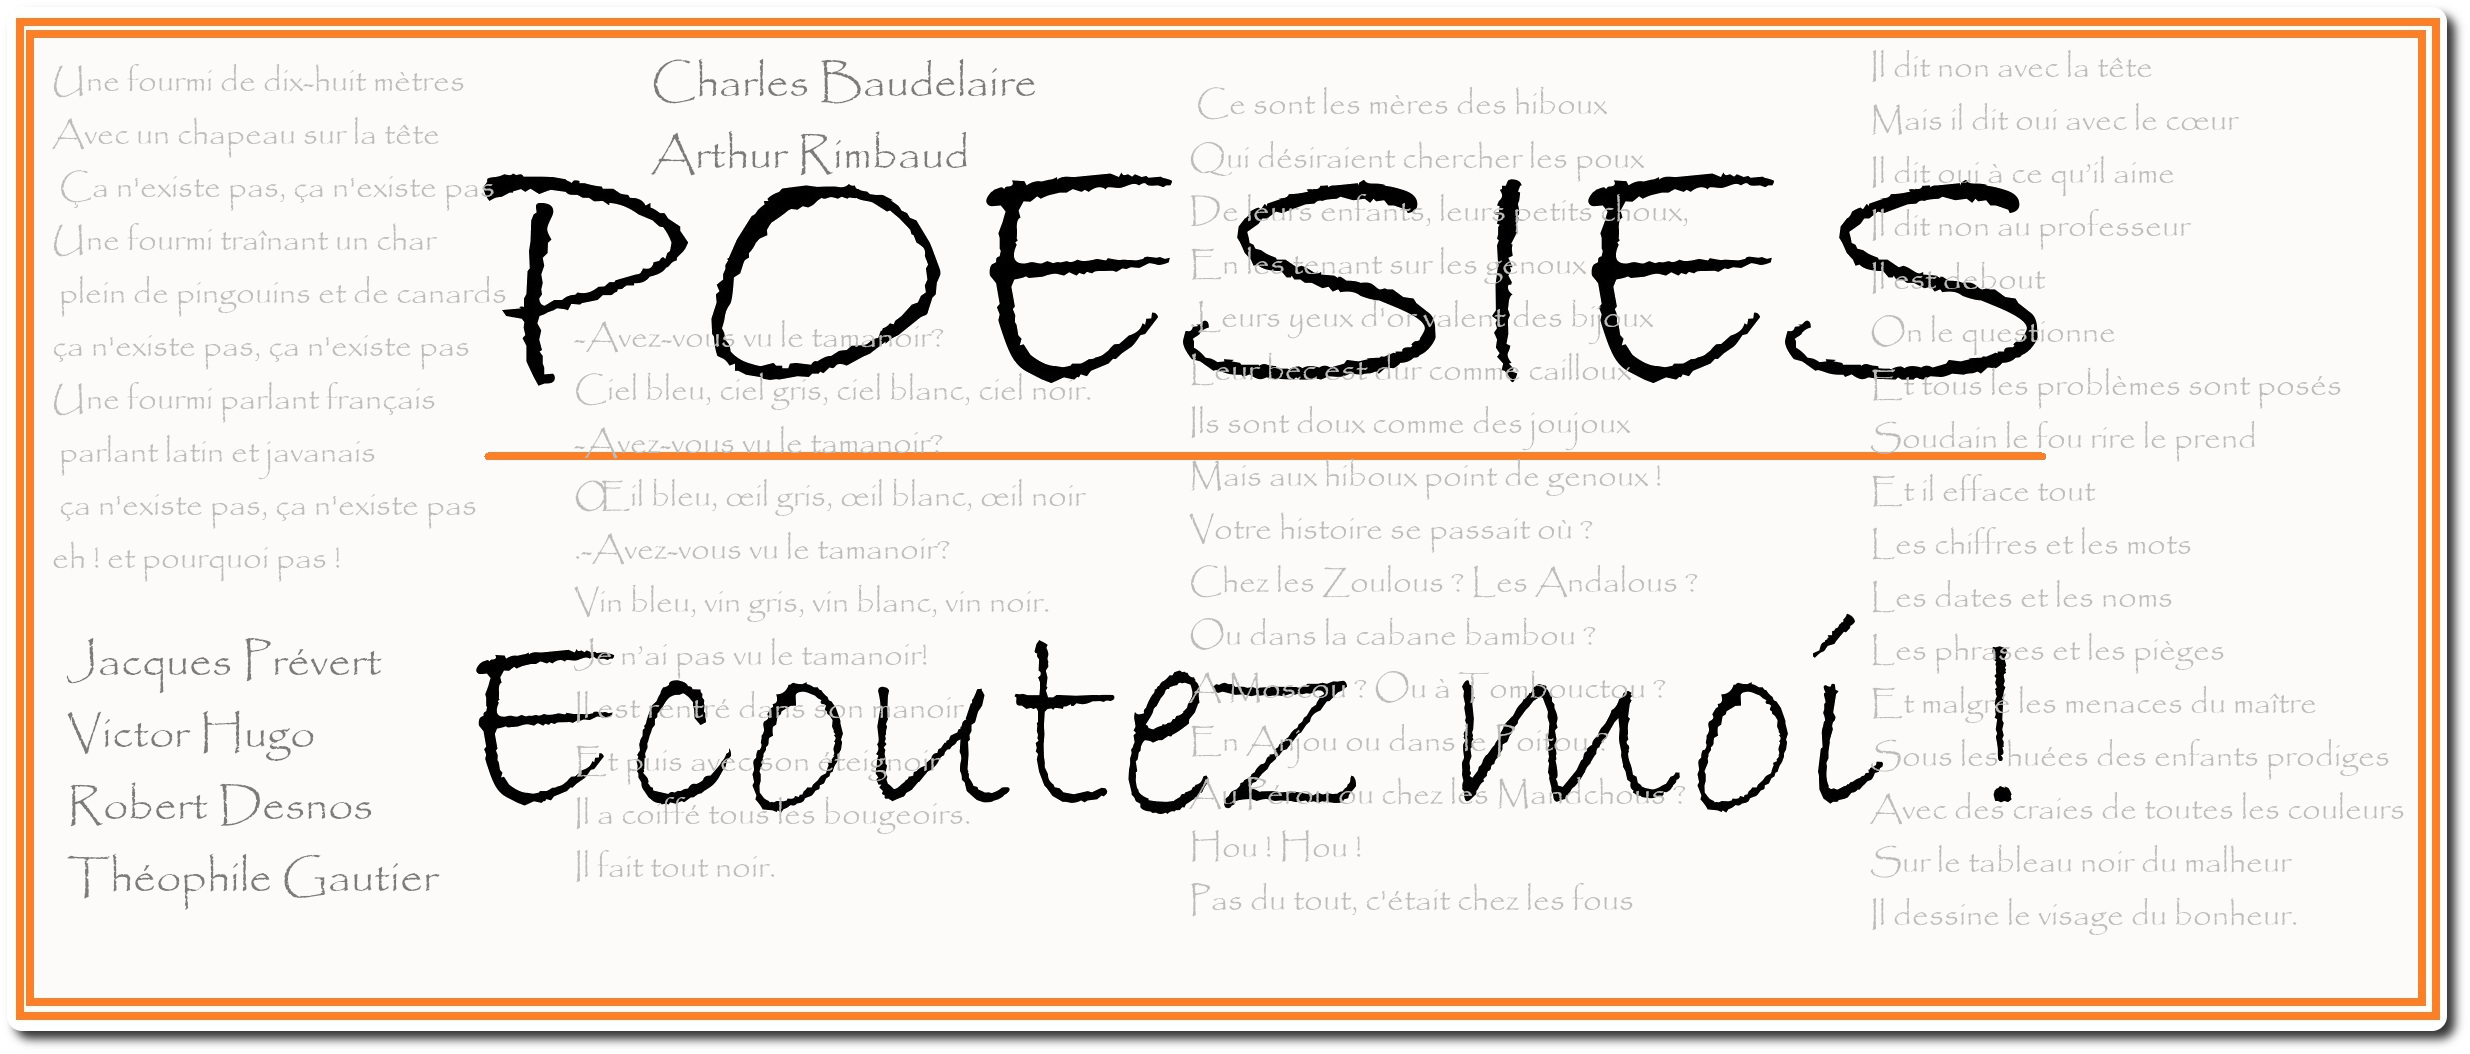 Poésie Prêtez Loreille Orinoco